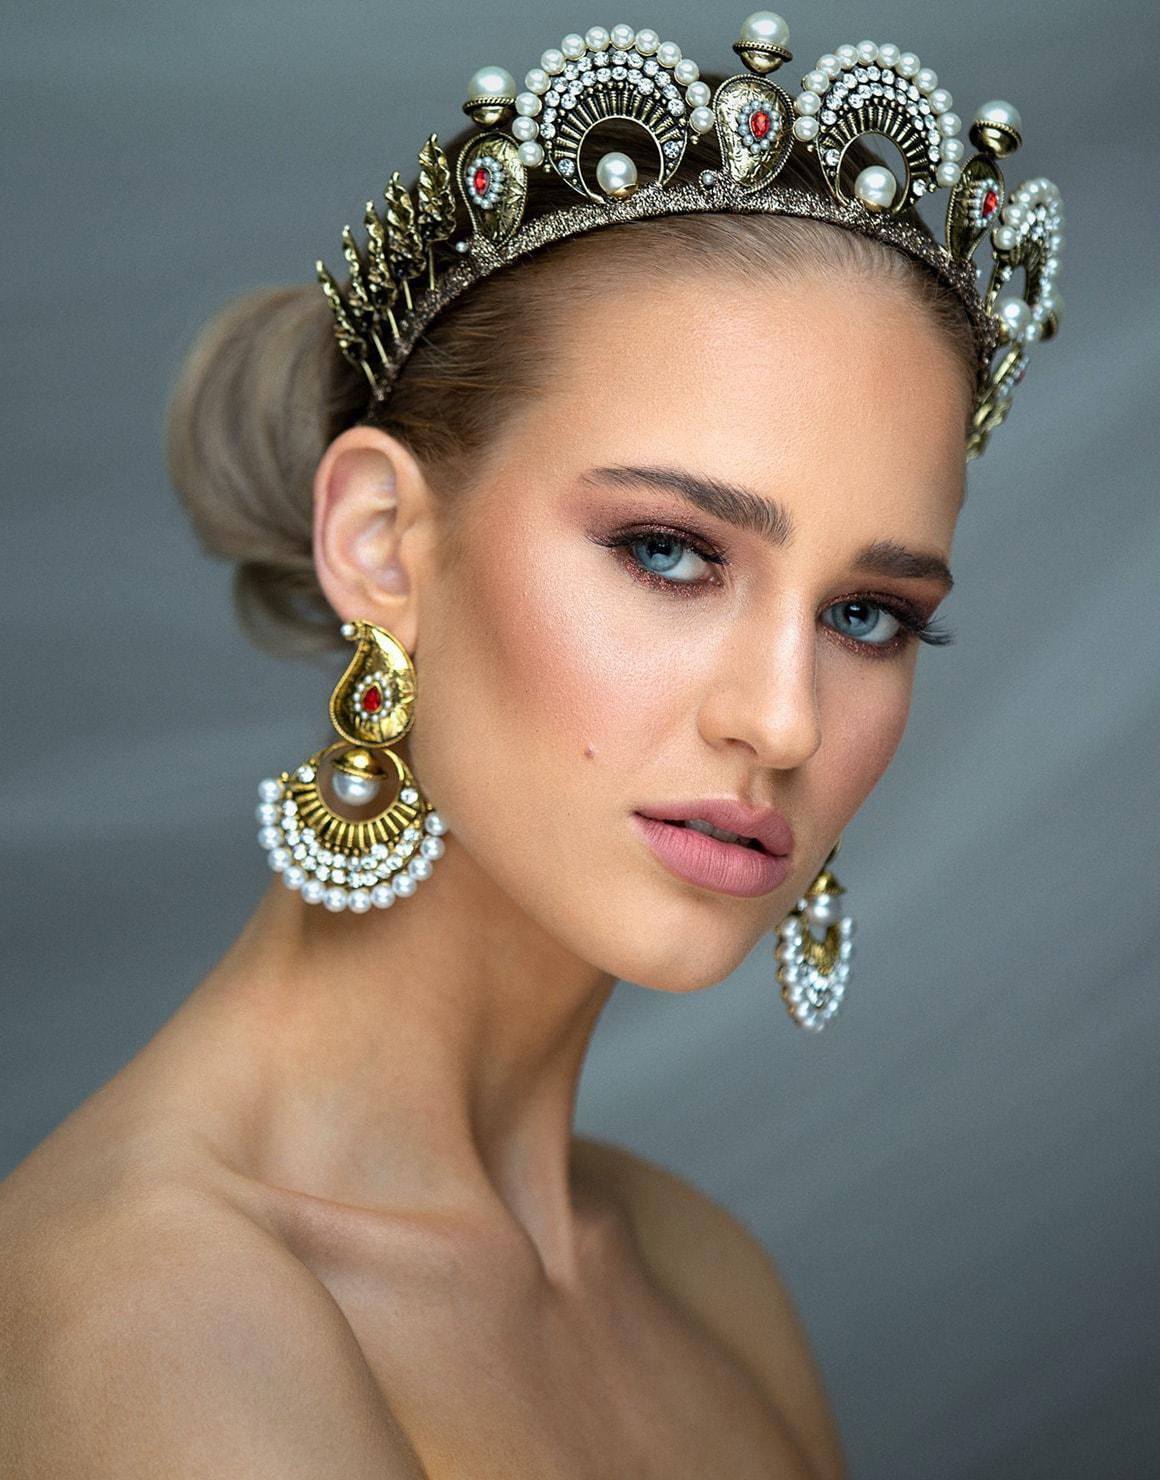 women wearing a bridal crown